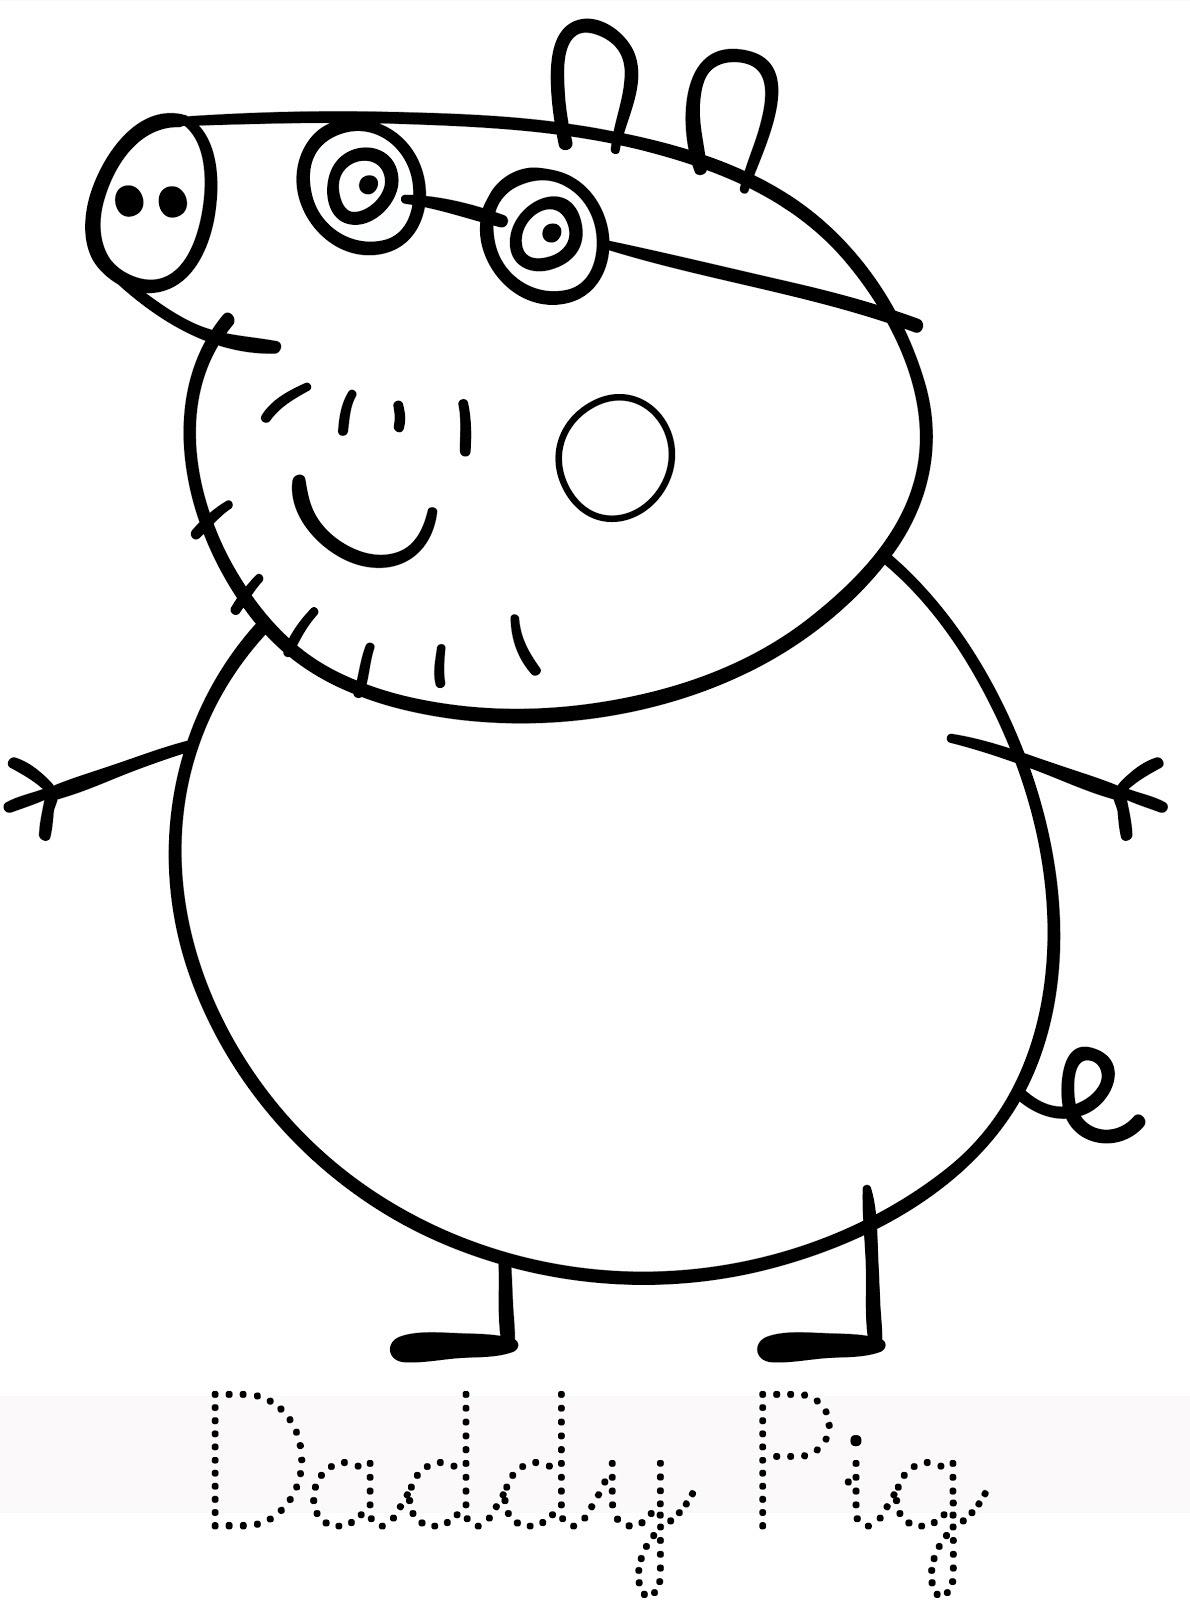 Coloriage peppa pig gratuit dessin a imprimer 119